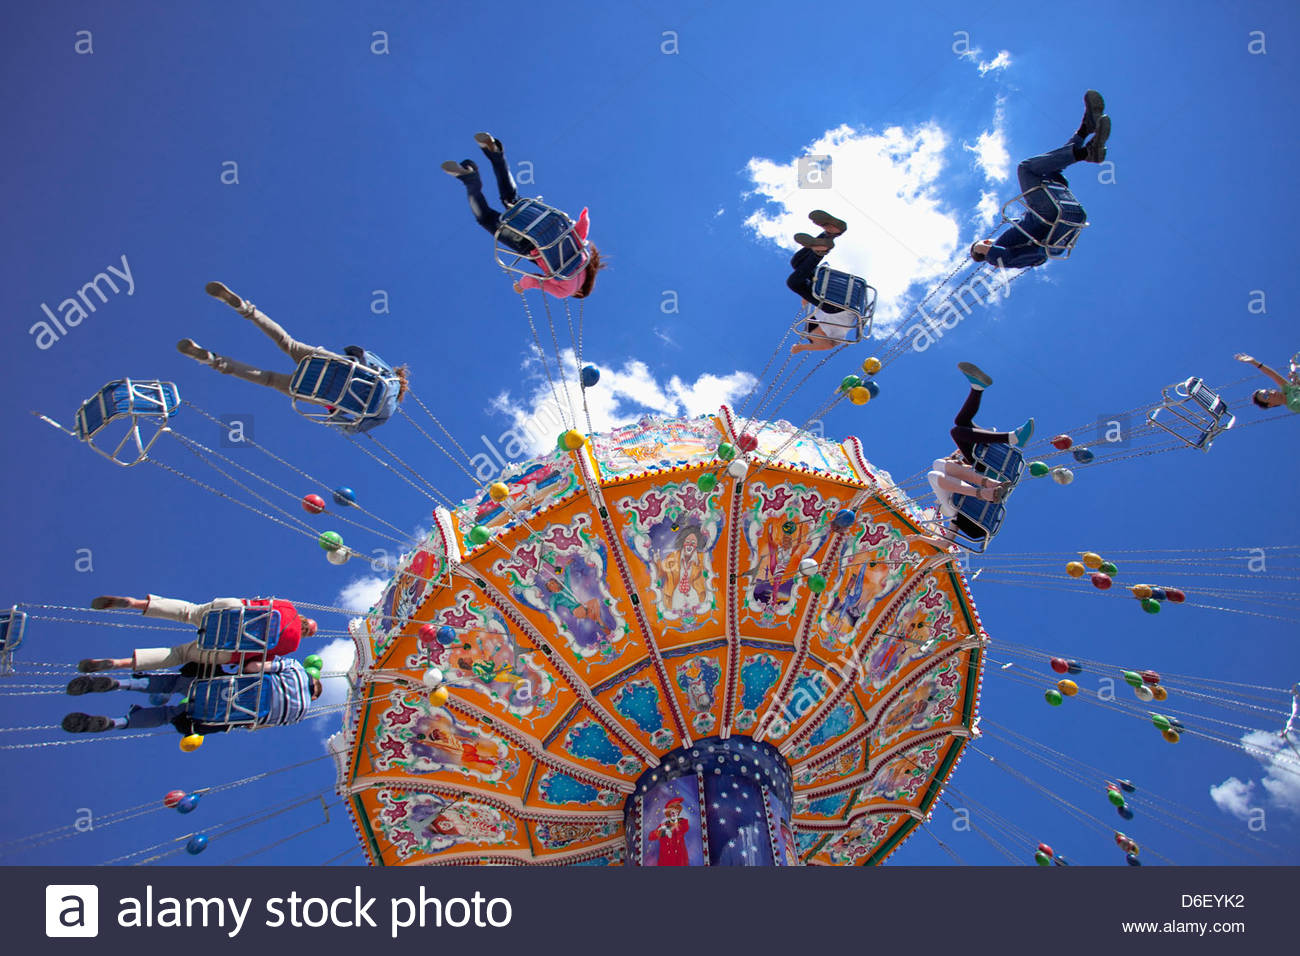 Oktoberfest carousel Merry go round Munich Germany - Stock Image